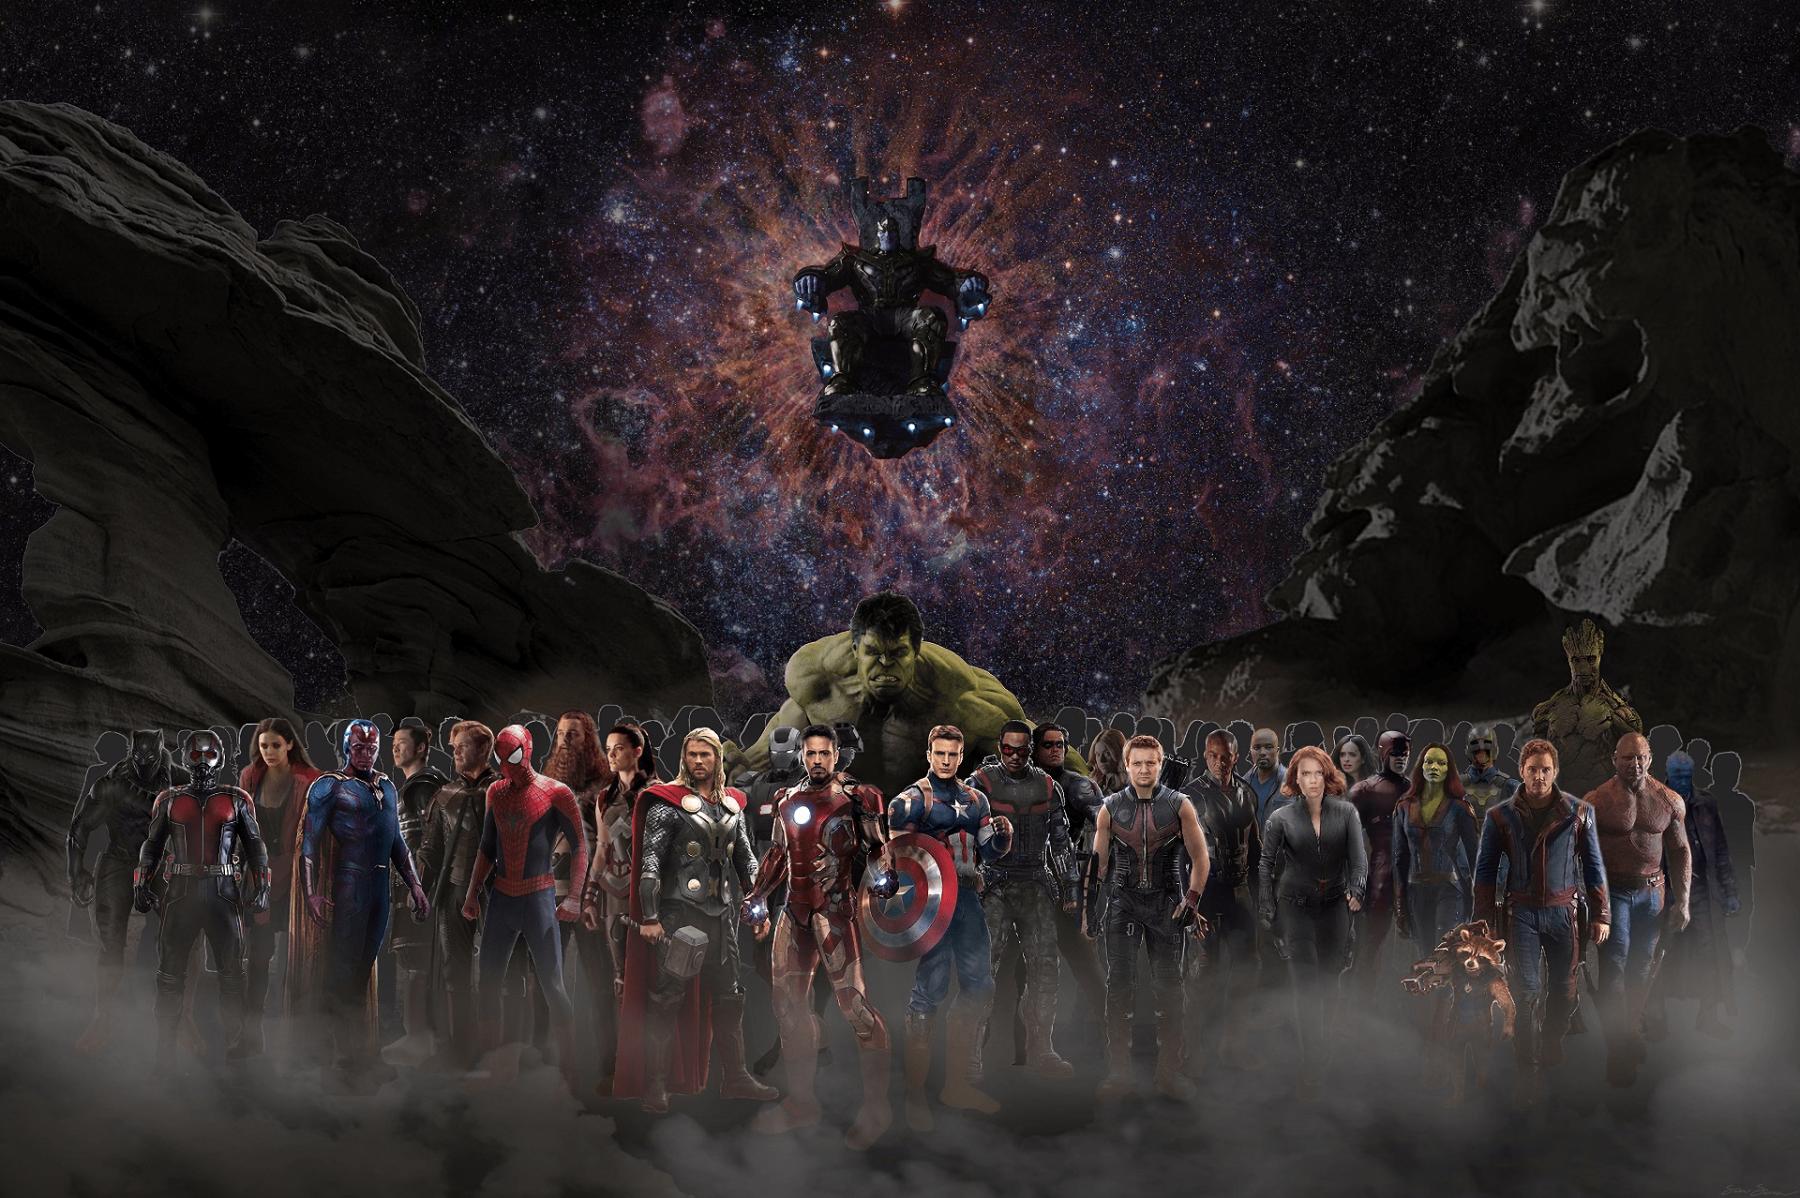 avengers: infinity war hd desktop wallpapers | 7wallpapers